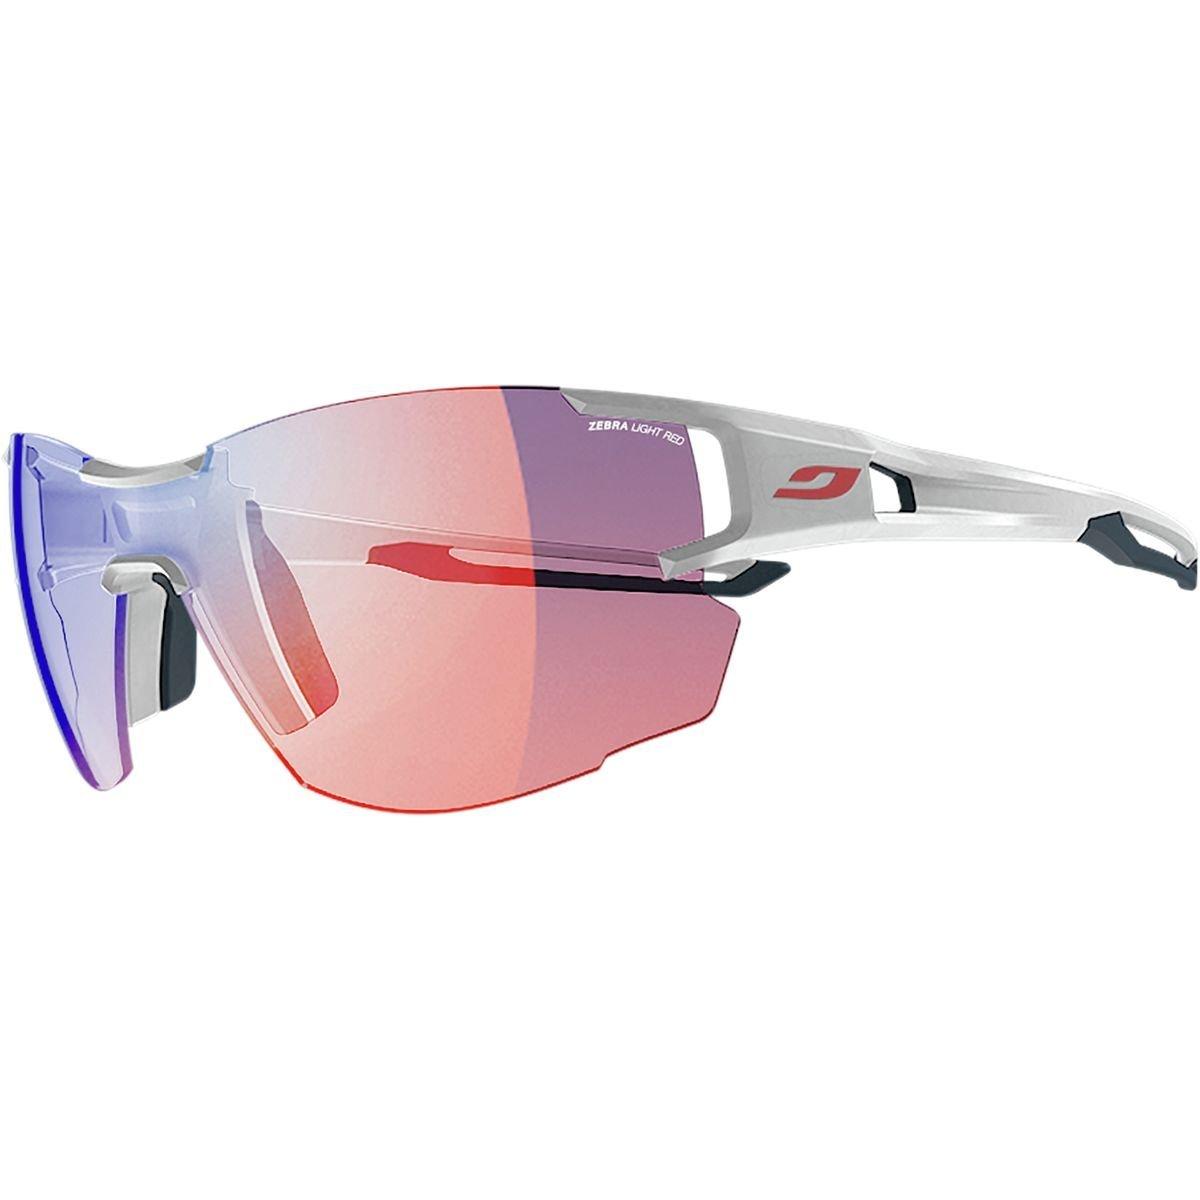 Julbo Aerolite Sunglasses review